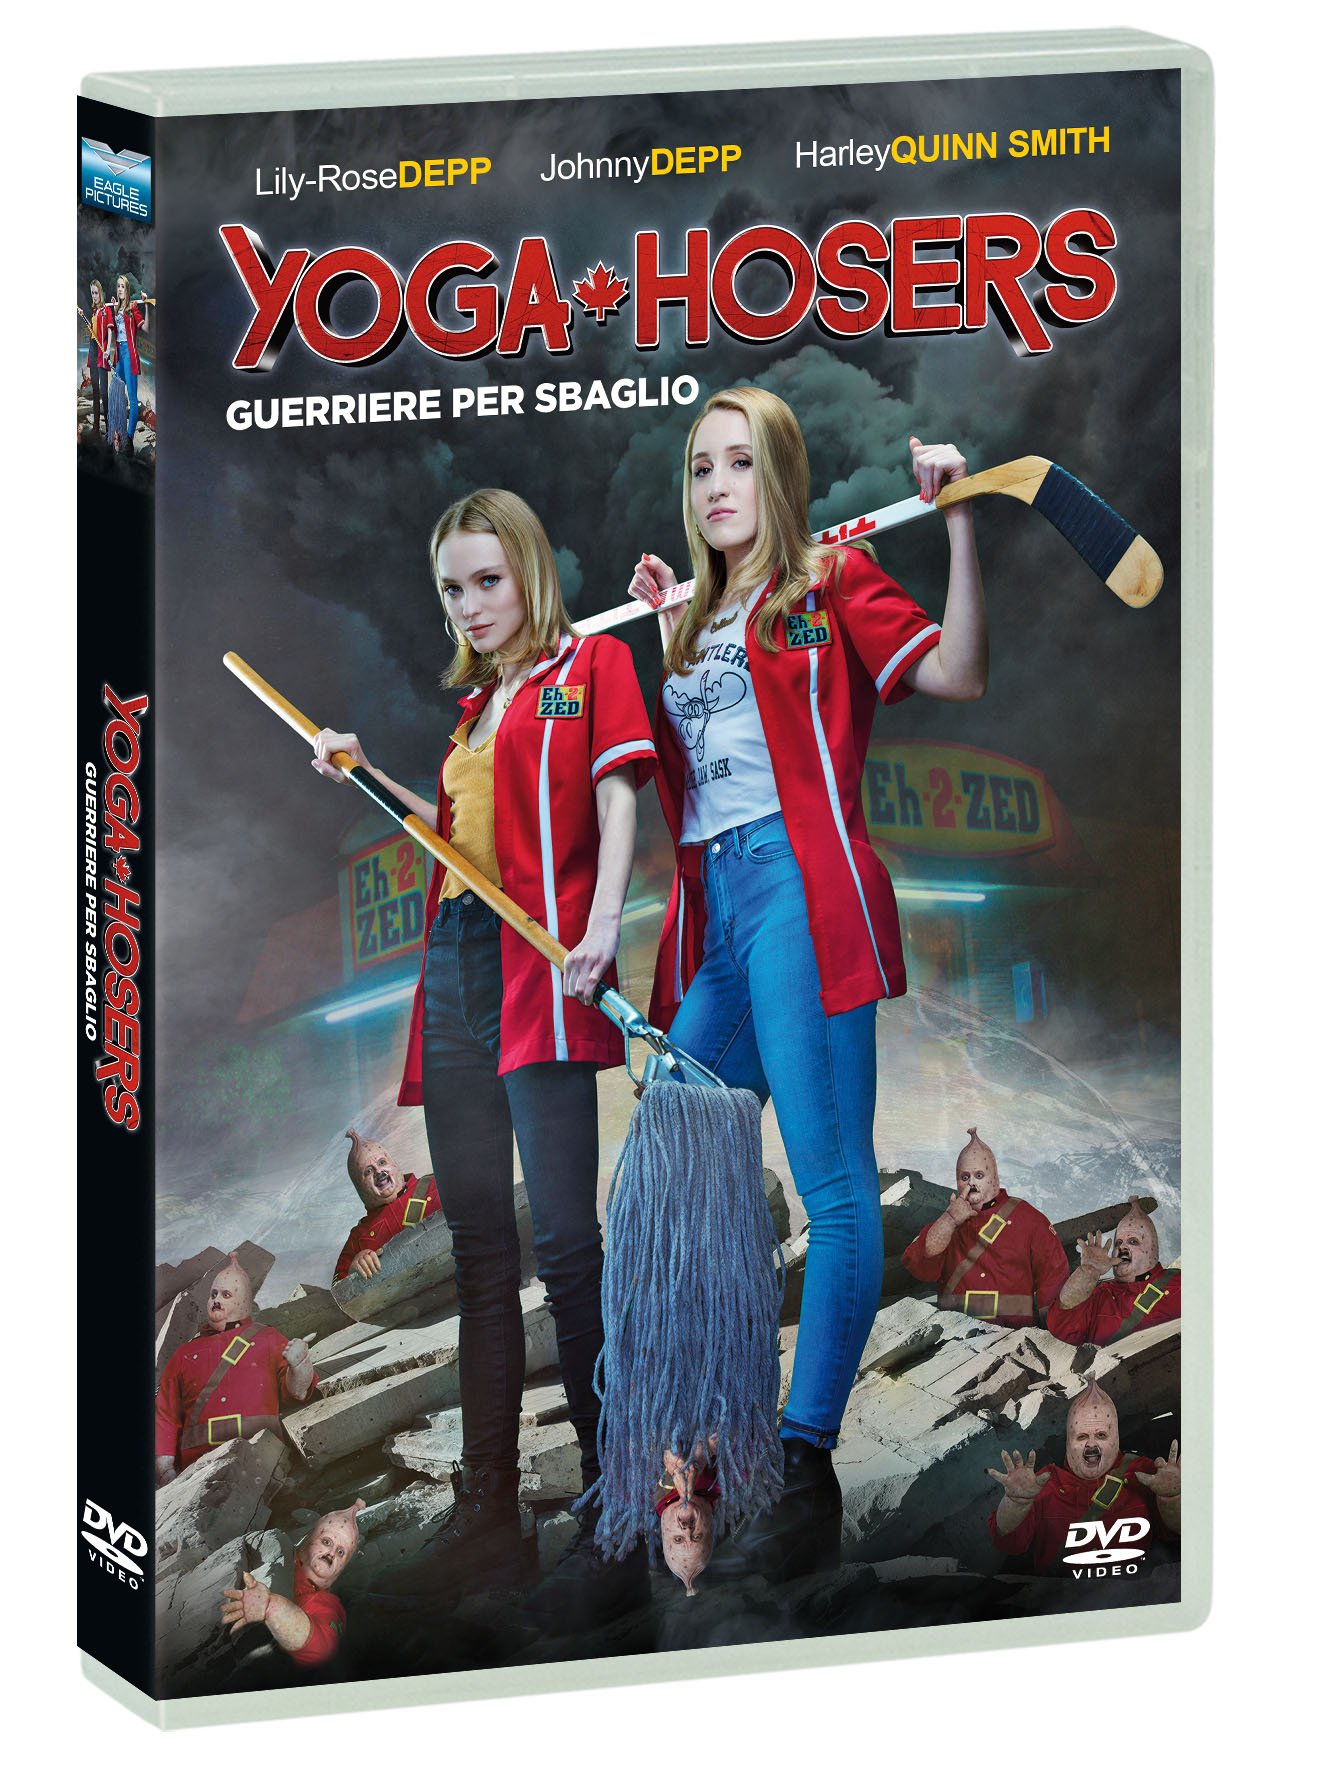 YOGA HOSERS - GUERRIERE PER SBAGLIO (DVD)